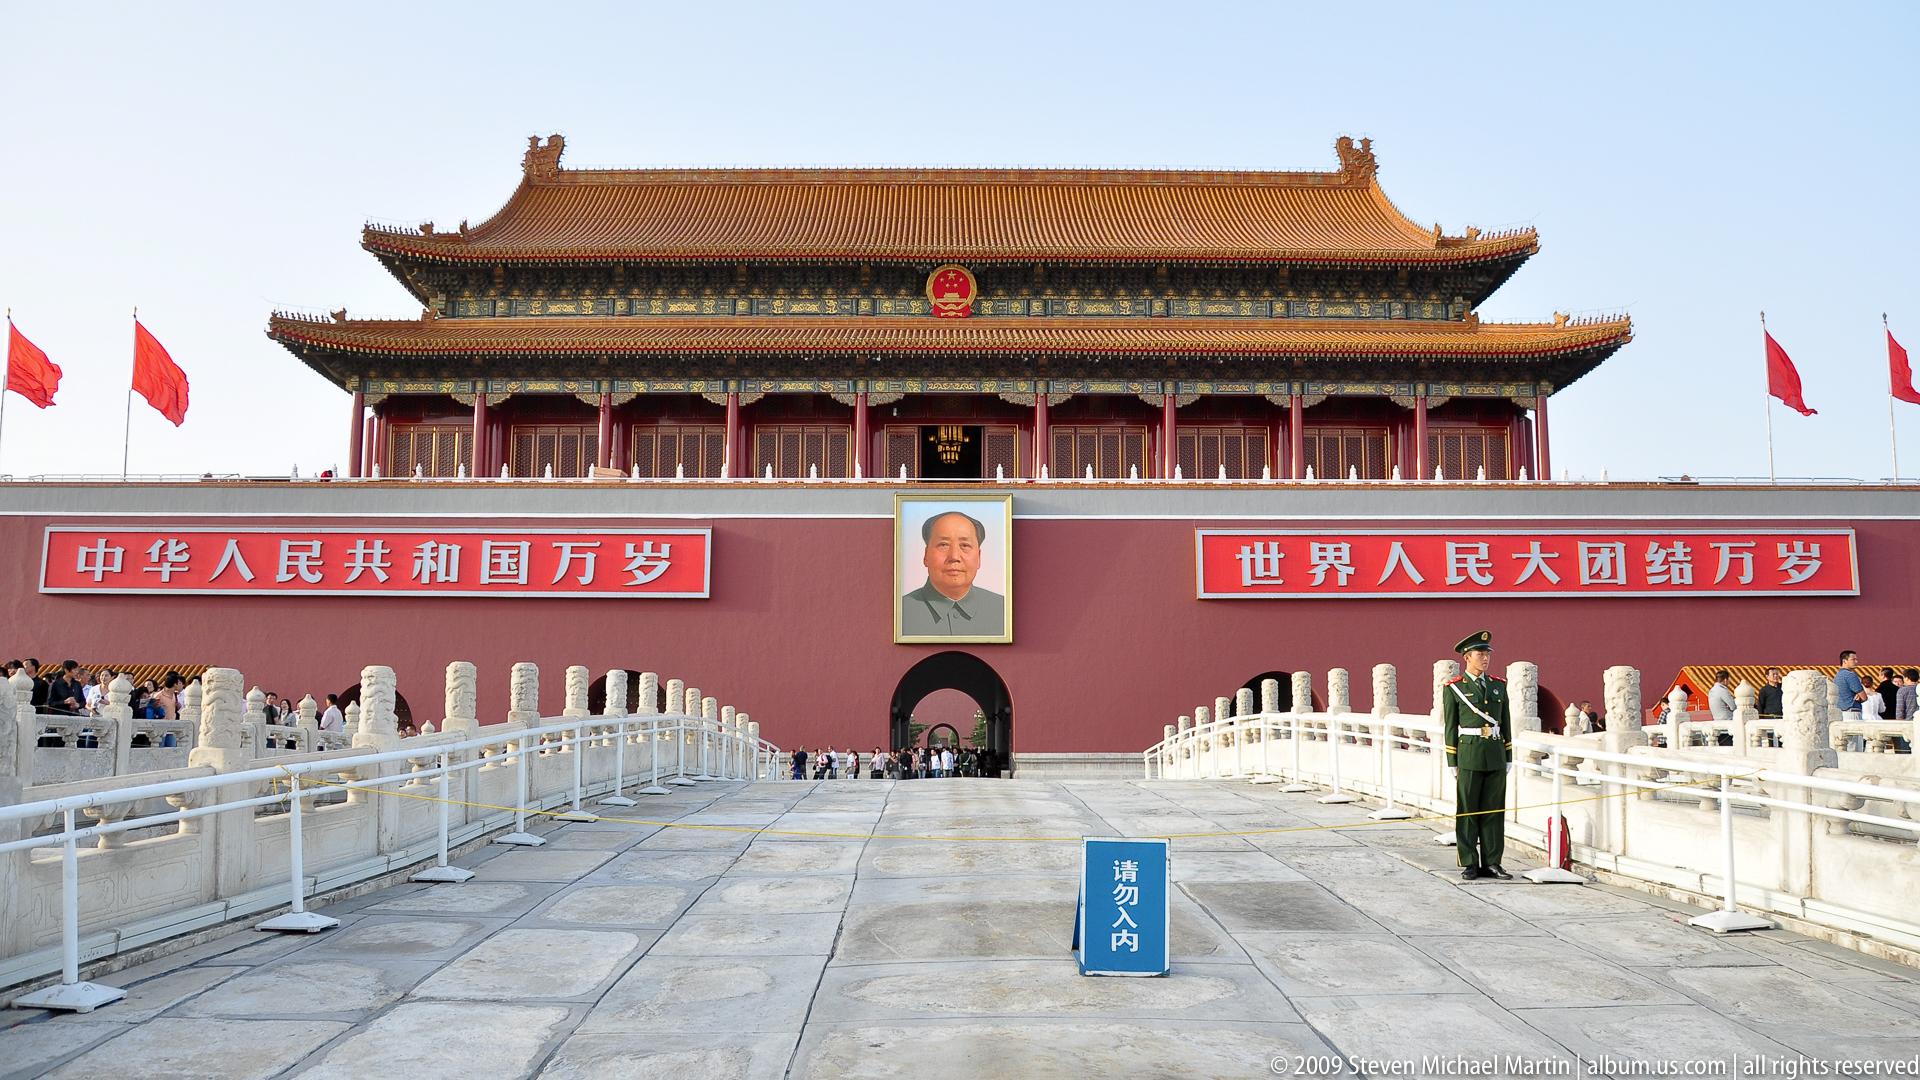 SMartin_2009 China Forbidden City (119 of 119)